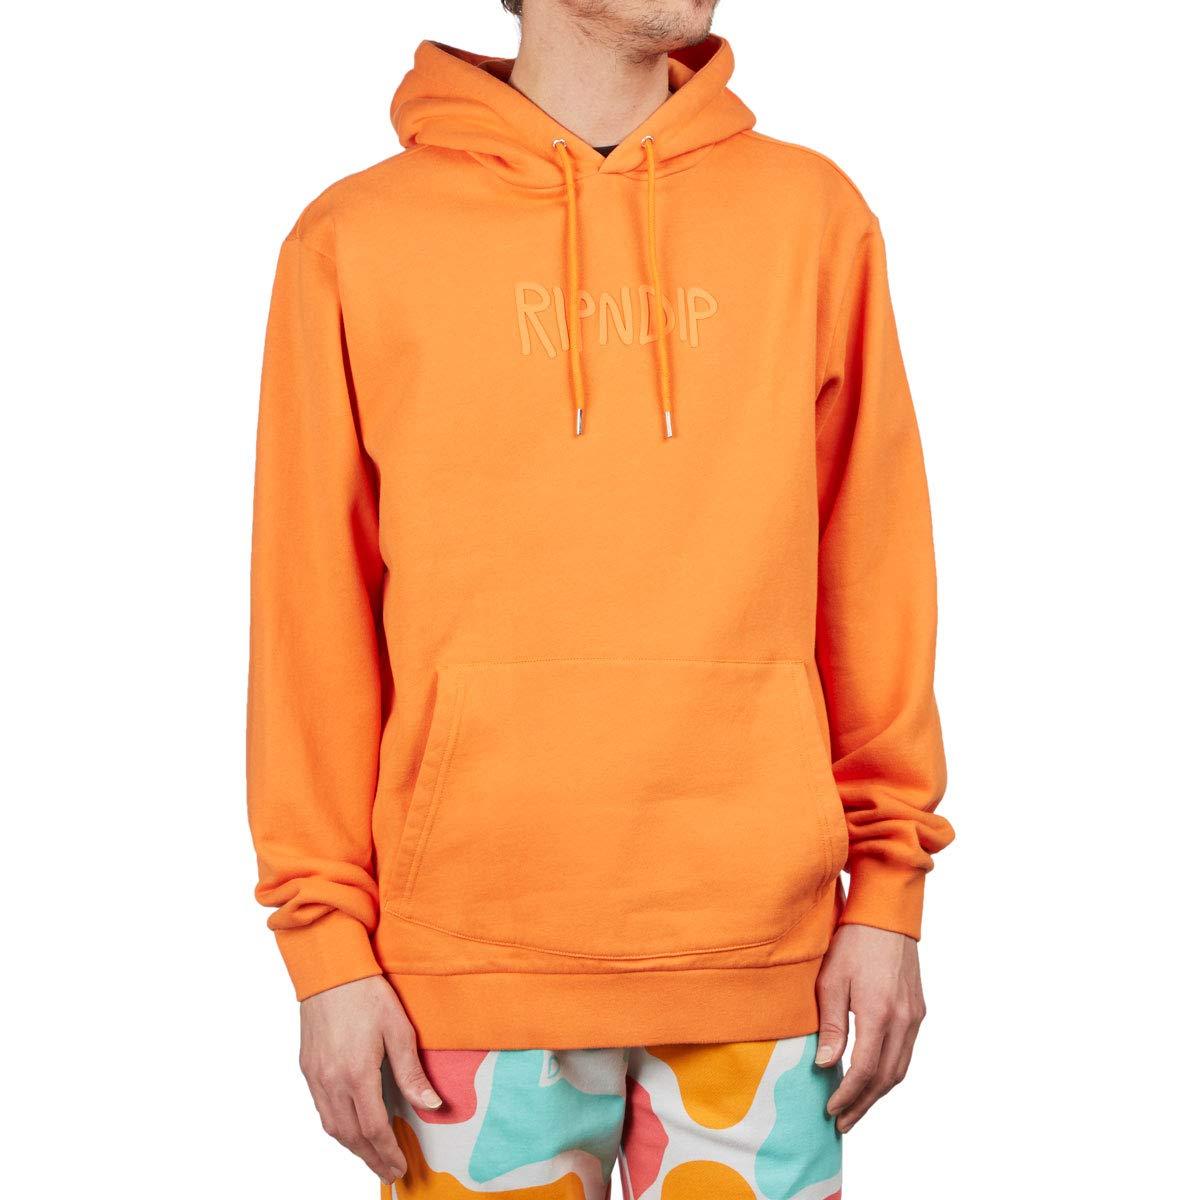 RIPNDIP Rubber Logo 3D Rubber Hoodie Orange